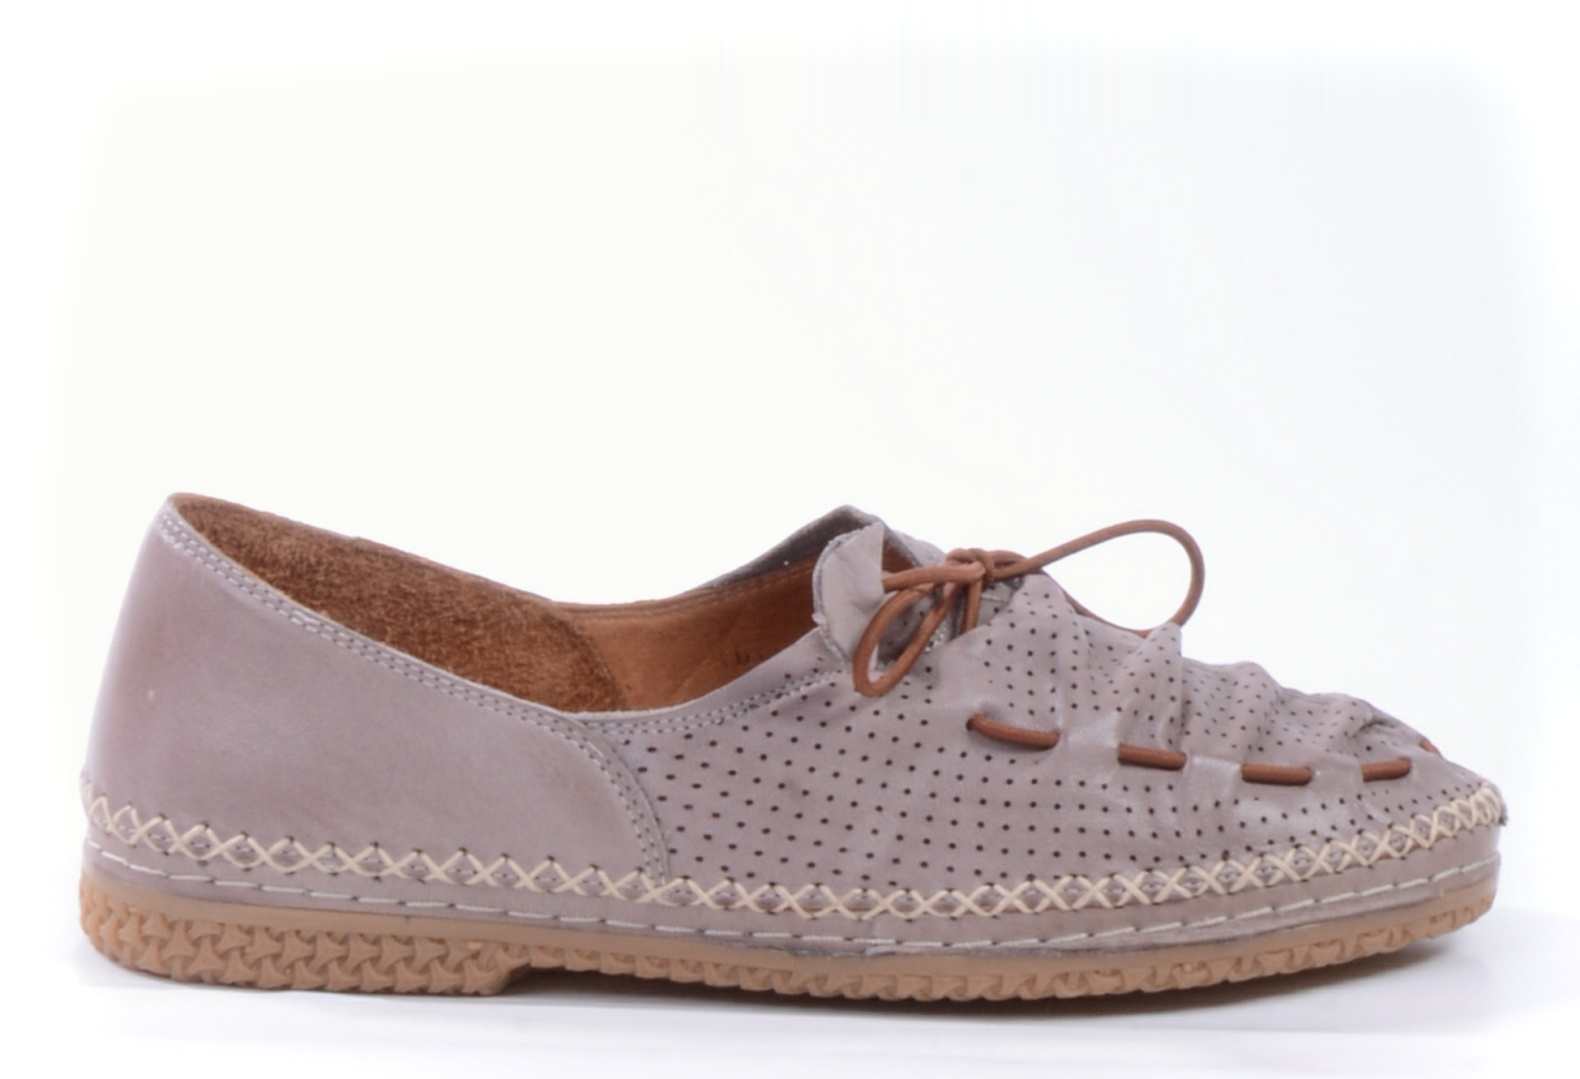 996f1526cdb6 Обувная компания